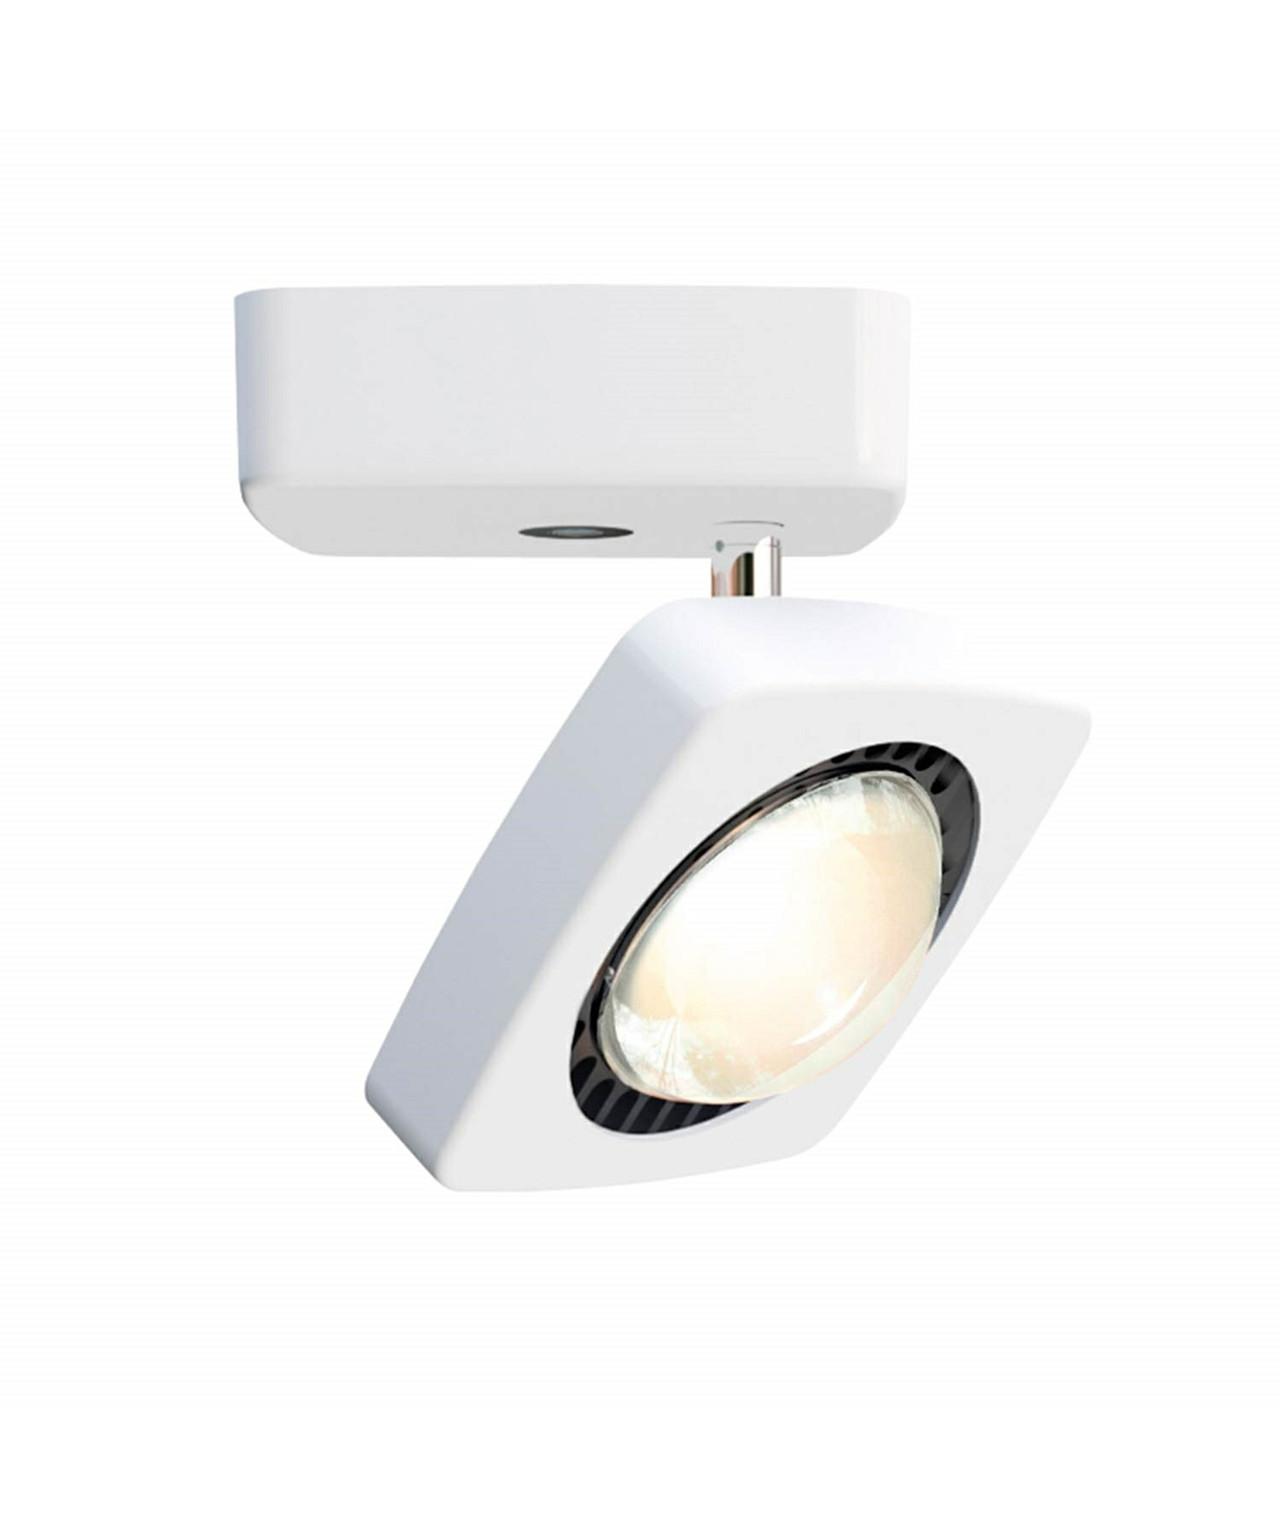 Kelveen Loftlampe/Væglampe Monted Turnable 90° - Oligo thumbnail